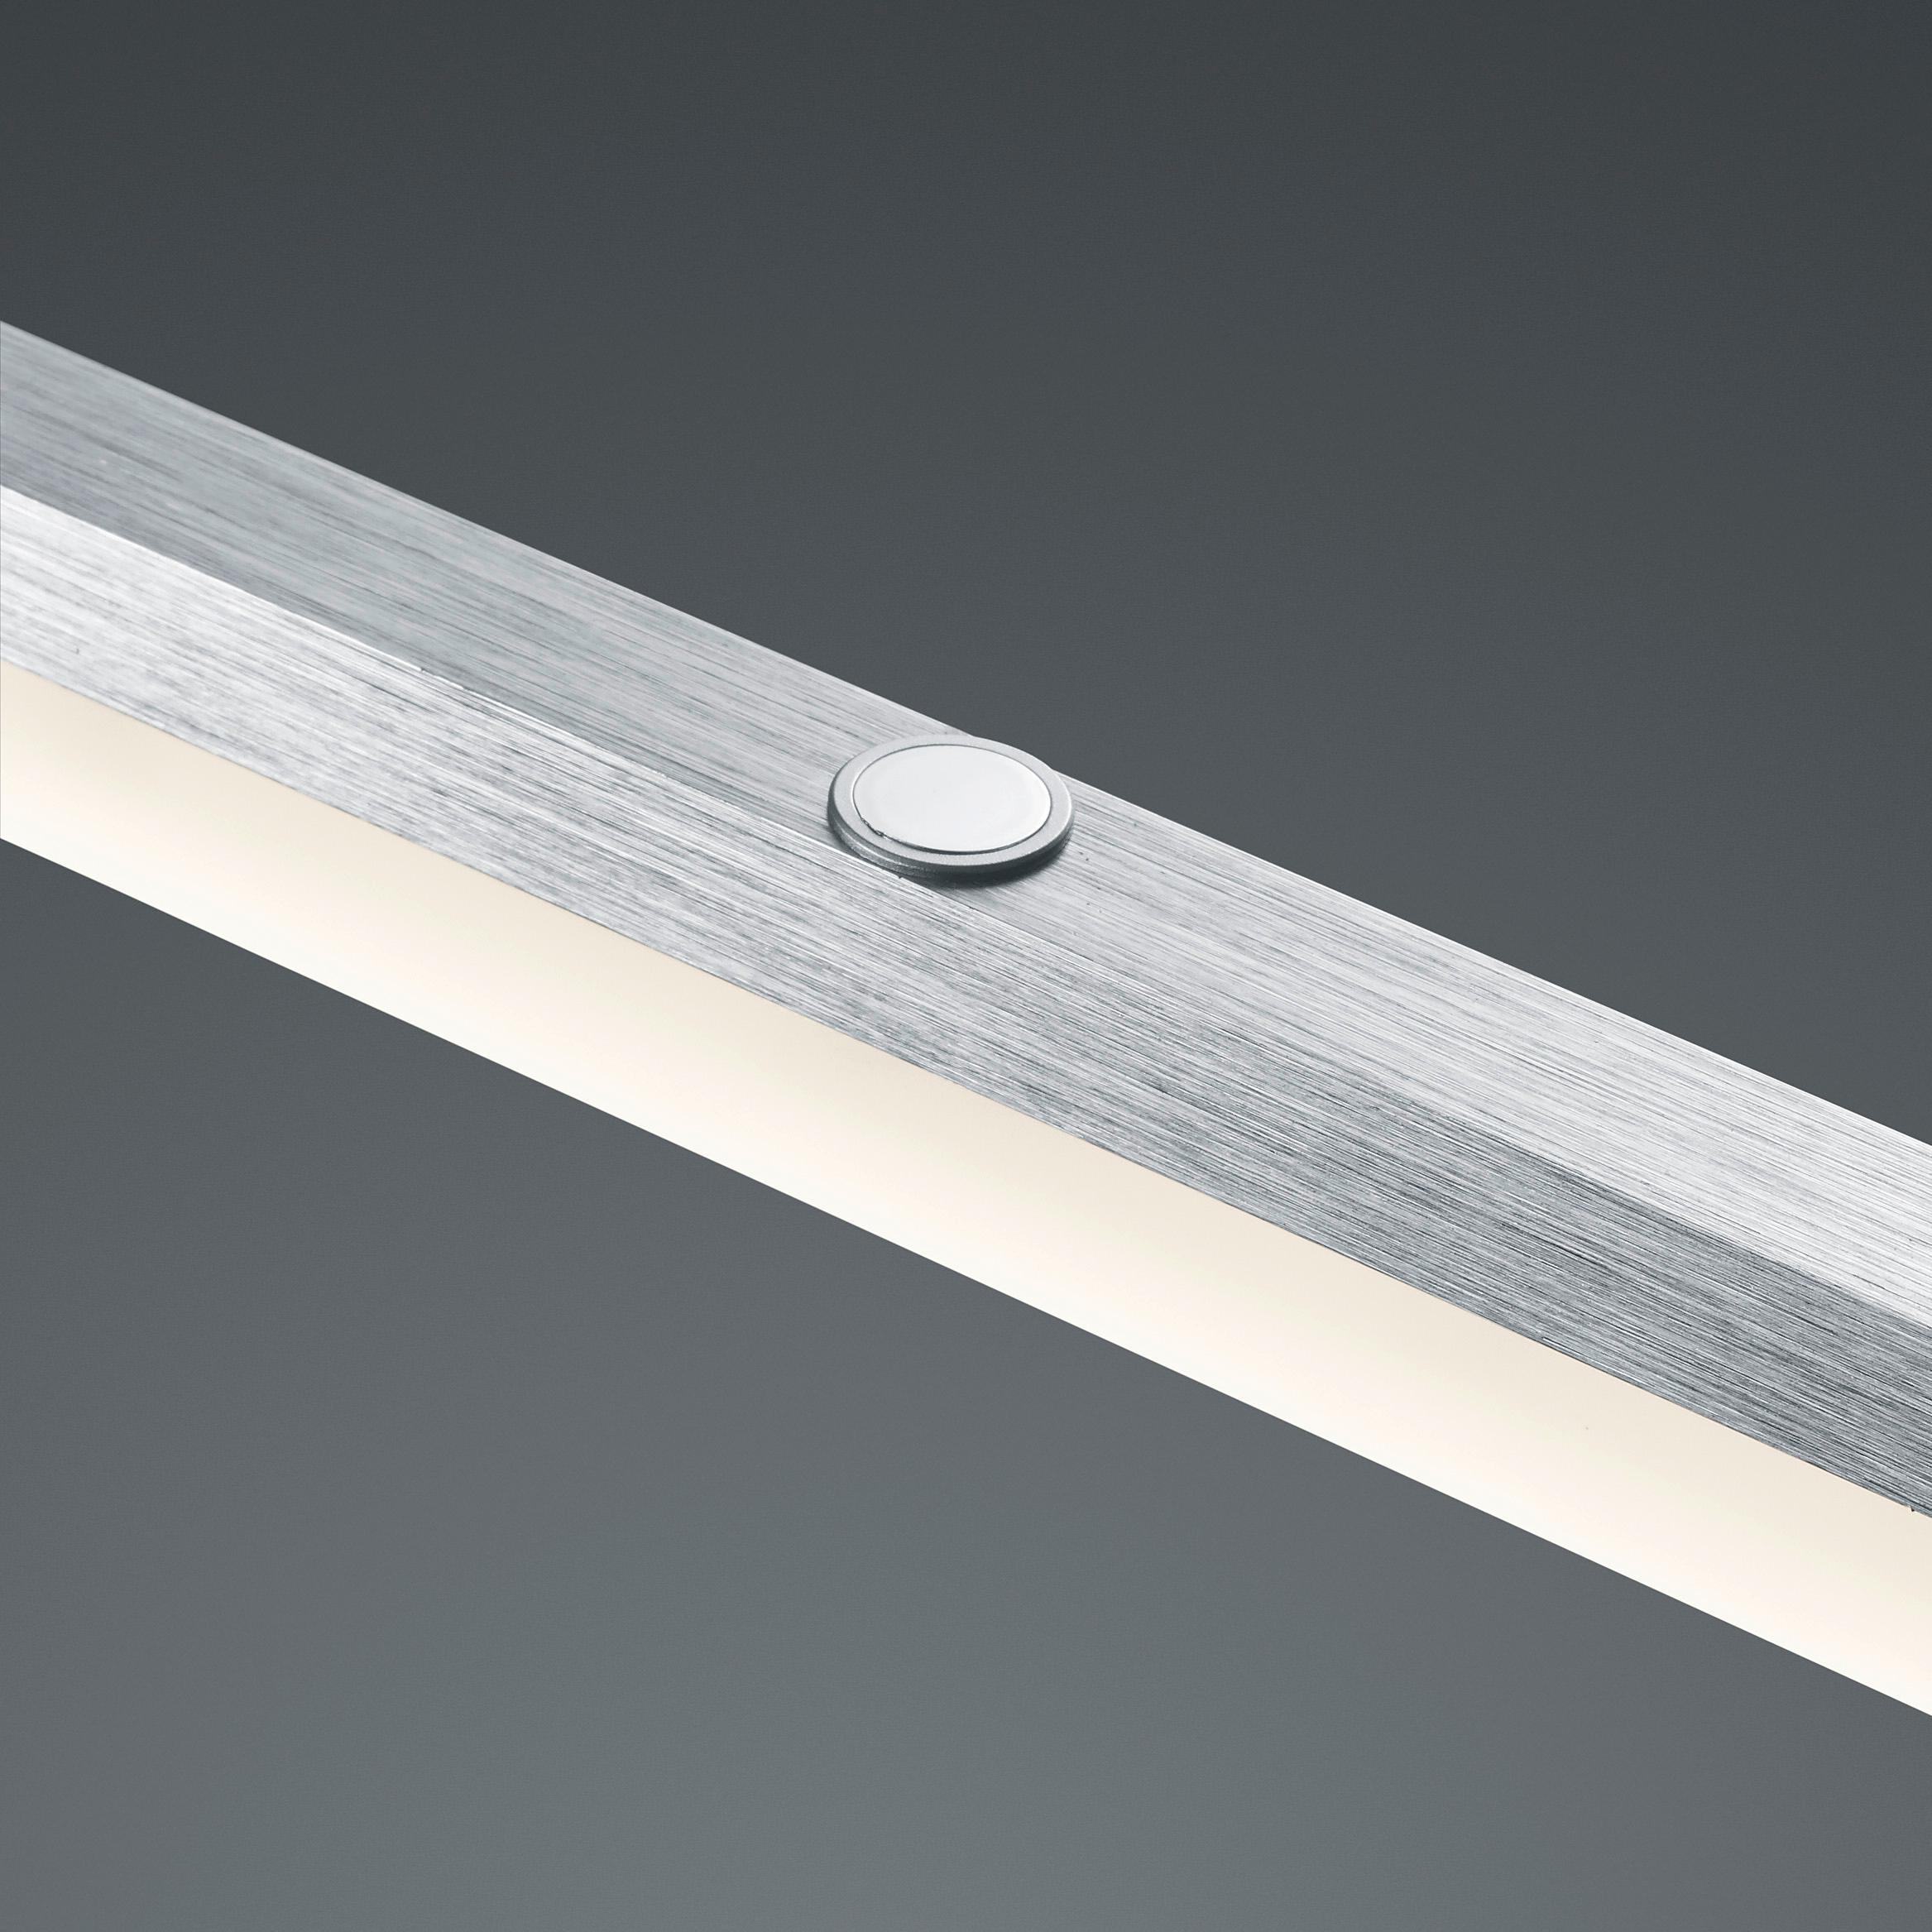 trio leuchten led jojo pendelleuchte calvaro aluminium gebr stet acryl wei 377690105 amazon. Black Bedroom Furniture Sets. Home Design Ideas